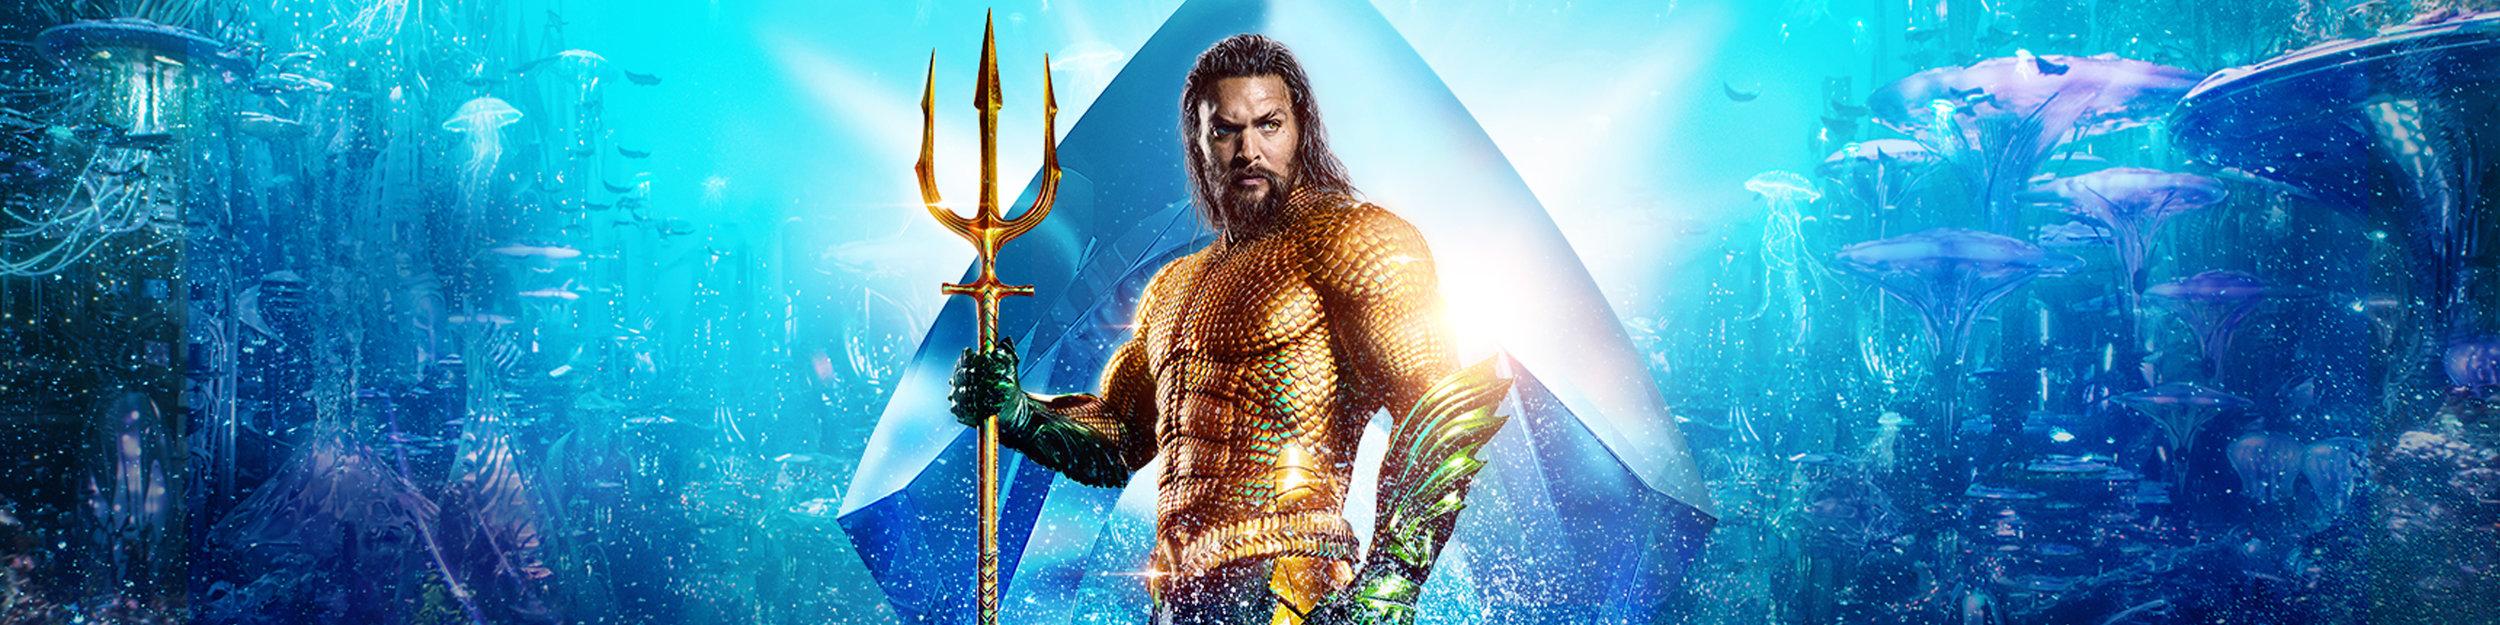 Aquaman_Inspiration.jpg